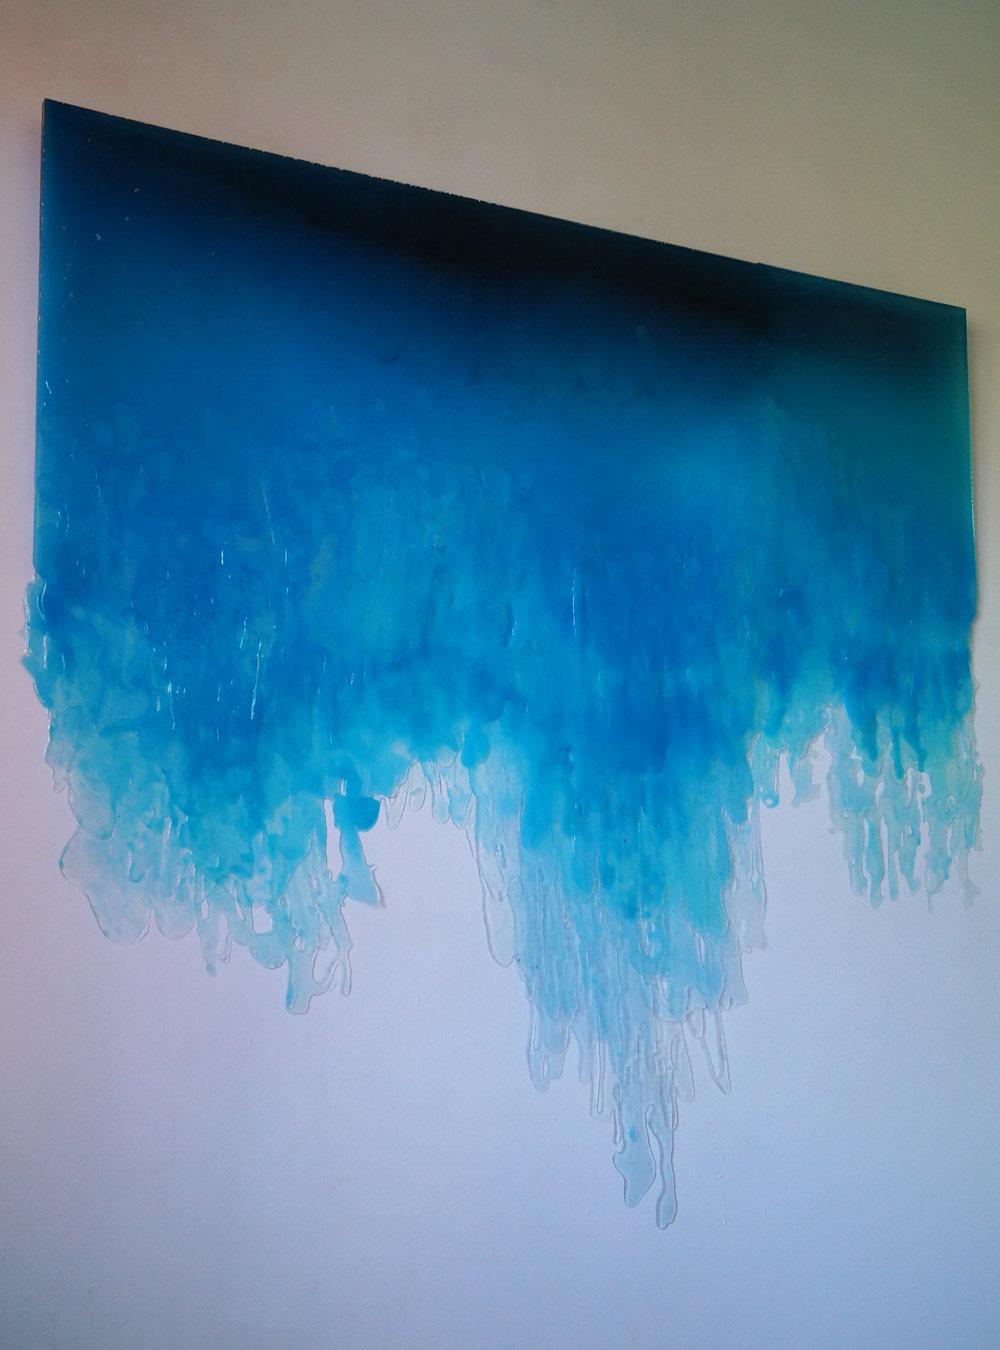 SOLUBLE I ,  2017  Metacrilato líquido, resina epoxi, acrílico  125 x 105 cm